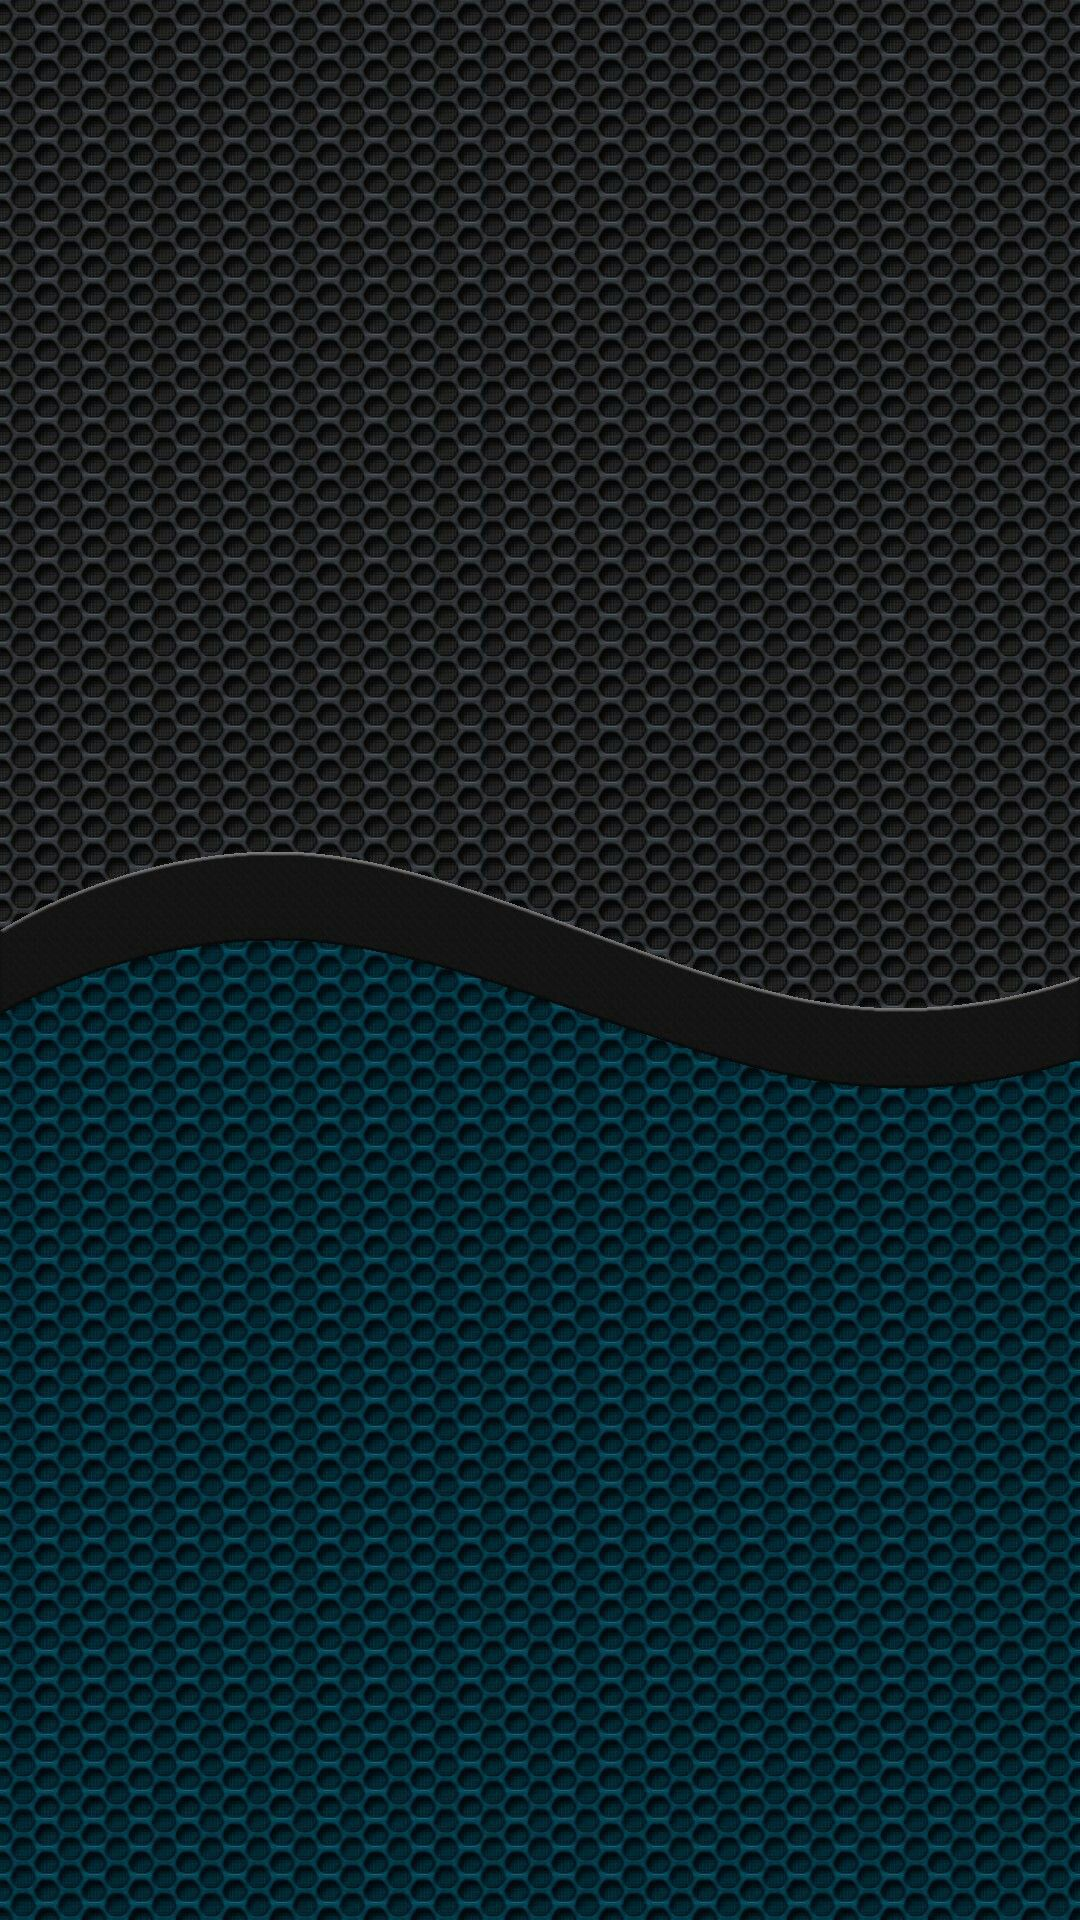 Samsung Galaxy Wallpaper, 1080p Wallpaper, Wallpaper For Your Phone, Luxury Wallpaper, Cellphone